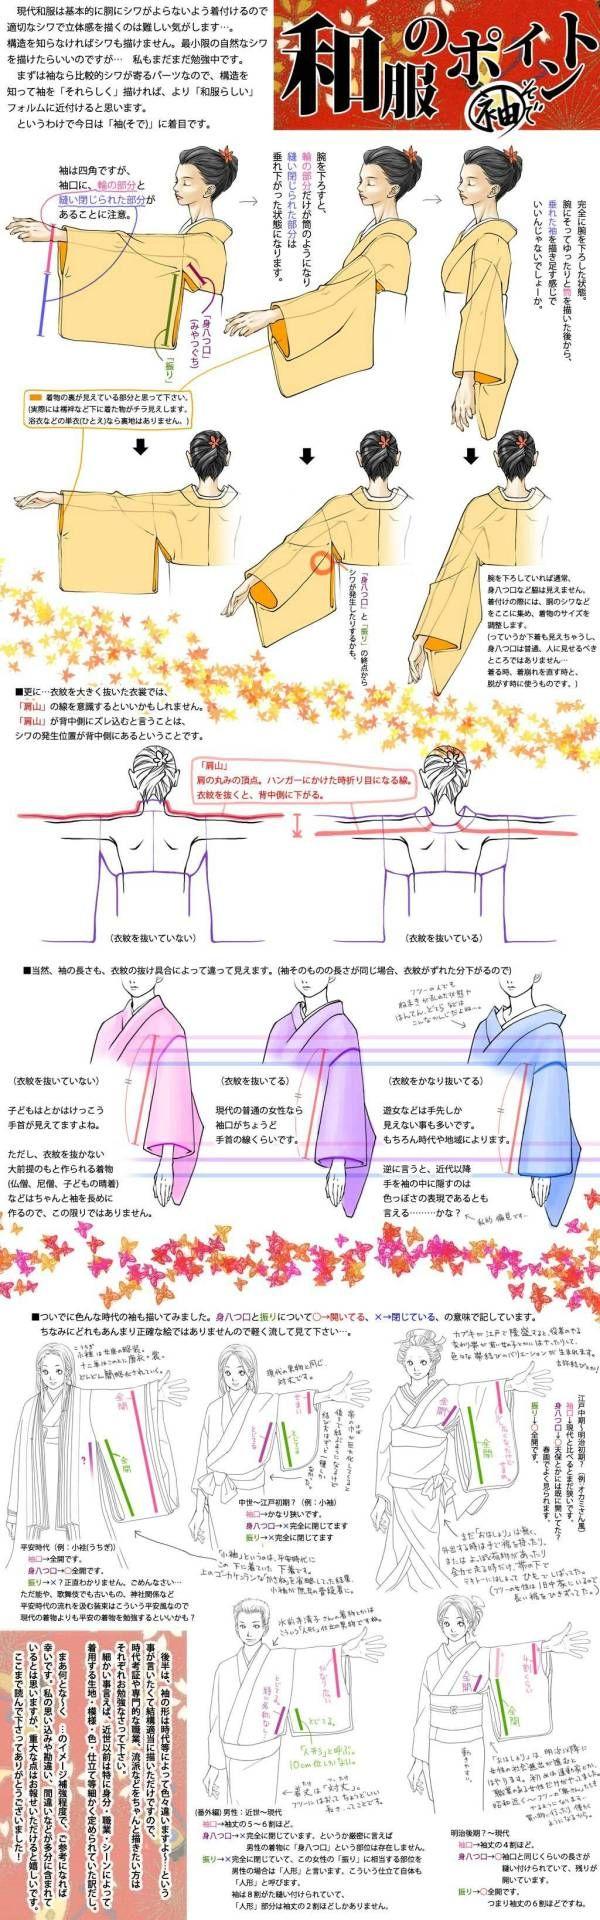 tumblr_n5glffyz5x1twkucxo10_r1_1280.jpg (600×1920) | Japan - Kimono ...